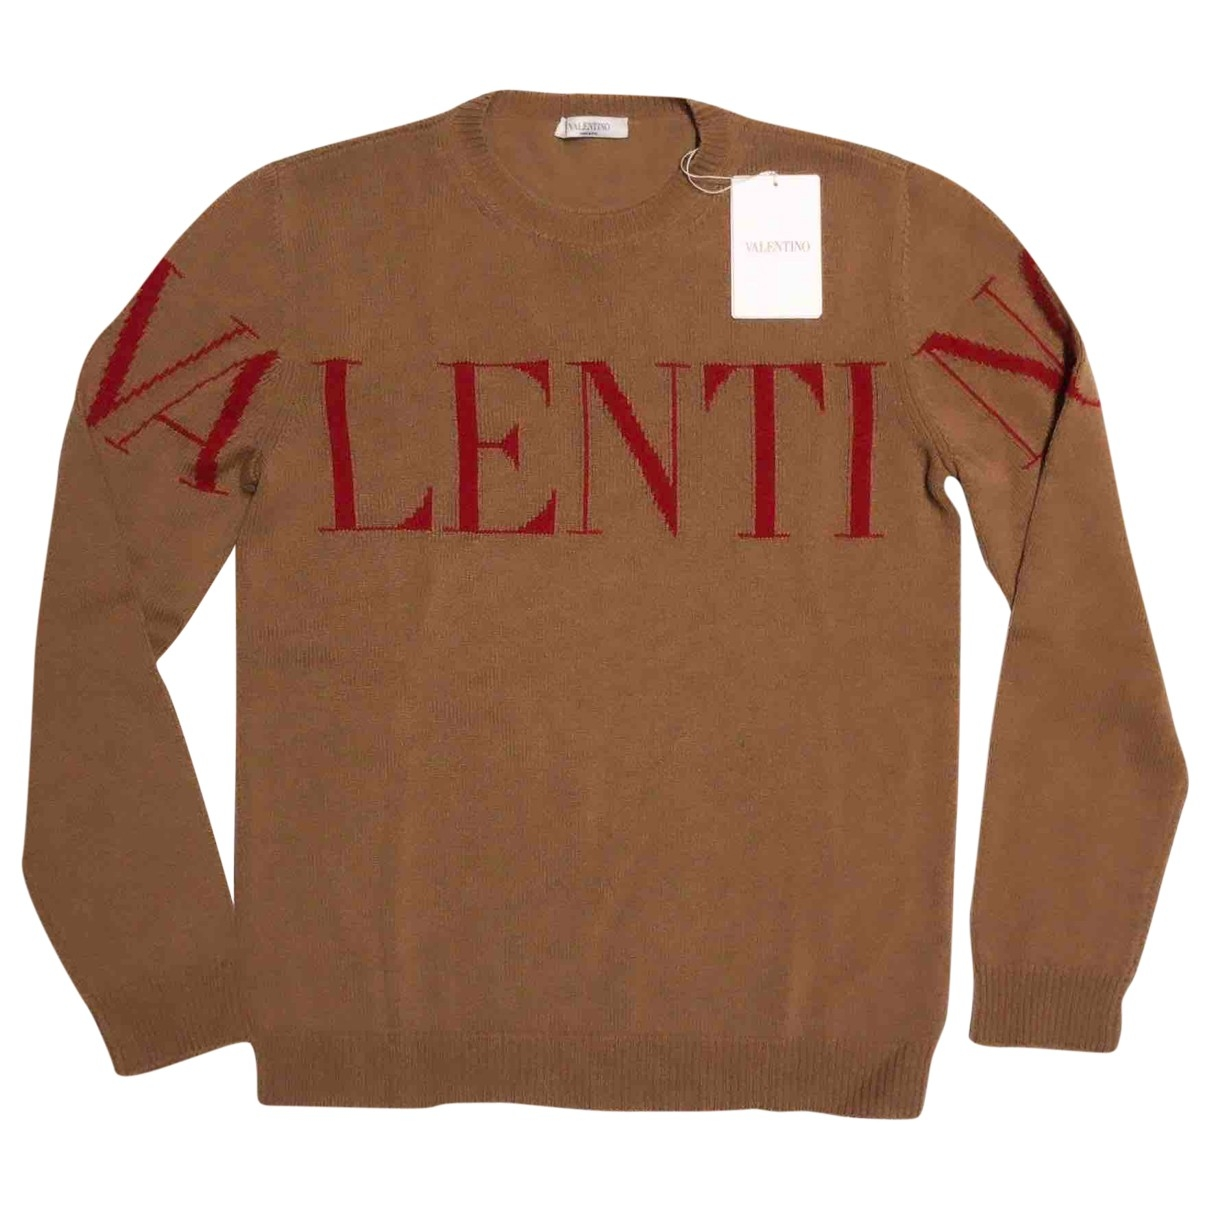 Valentino Garavani \N Camel Cashmere Knitwear & Sweatshirts for Men S International